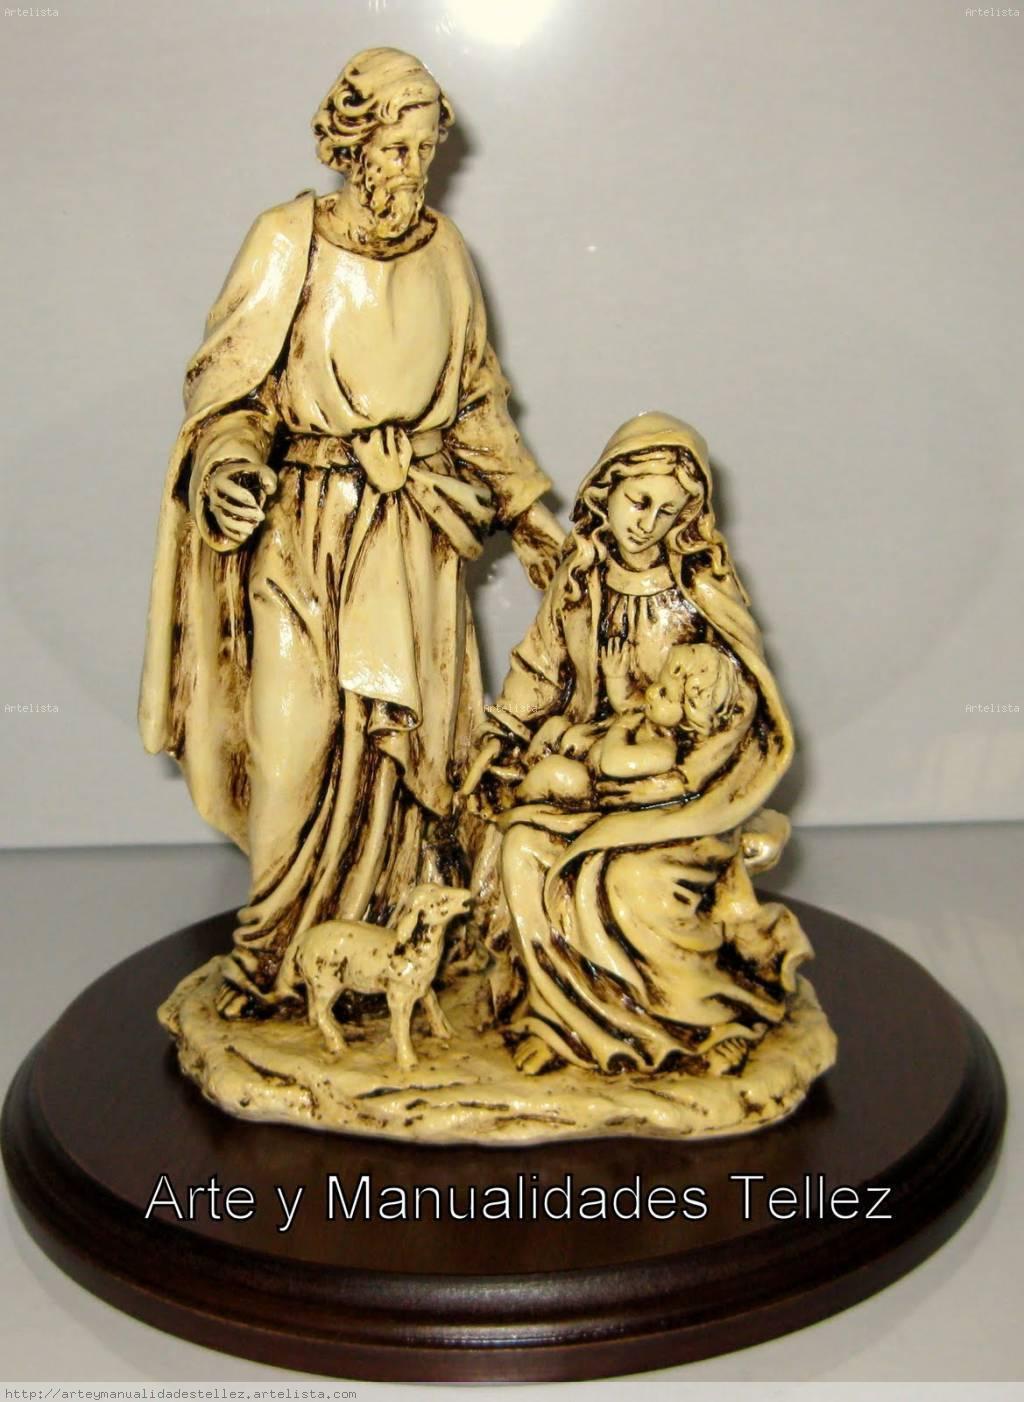 Belen marfil arte y manualidades tellez for Marfil ceramica madrid